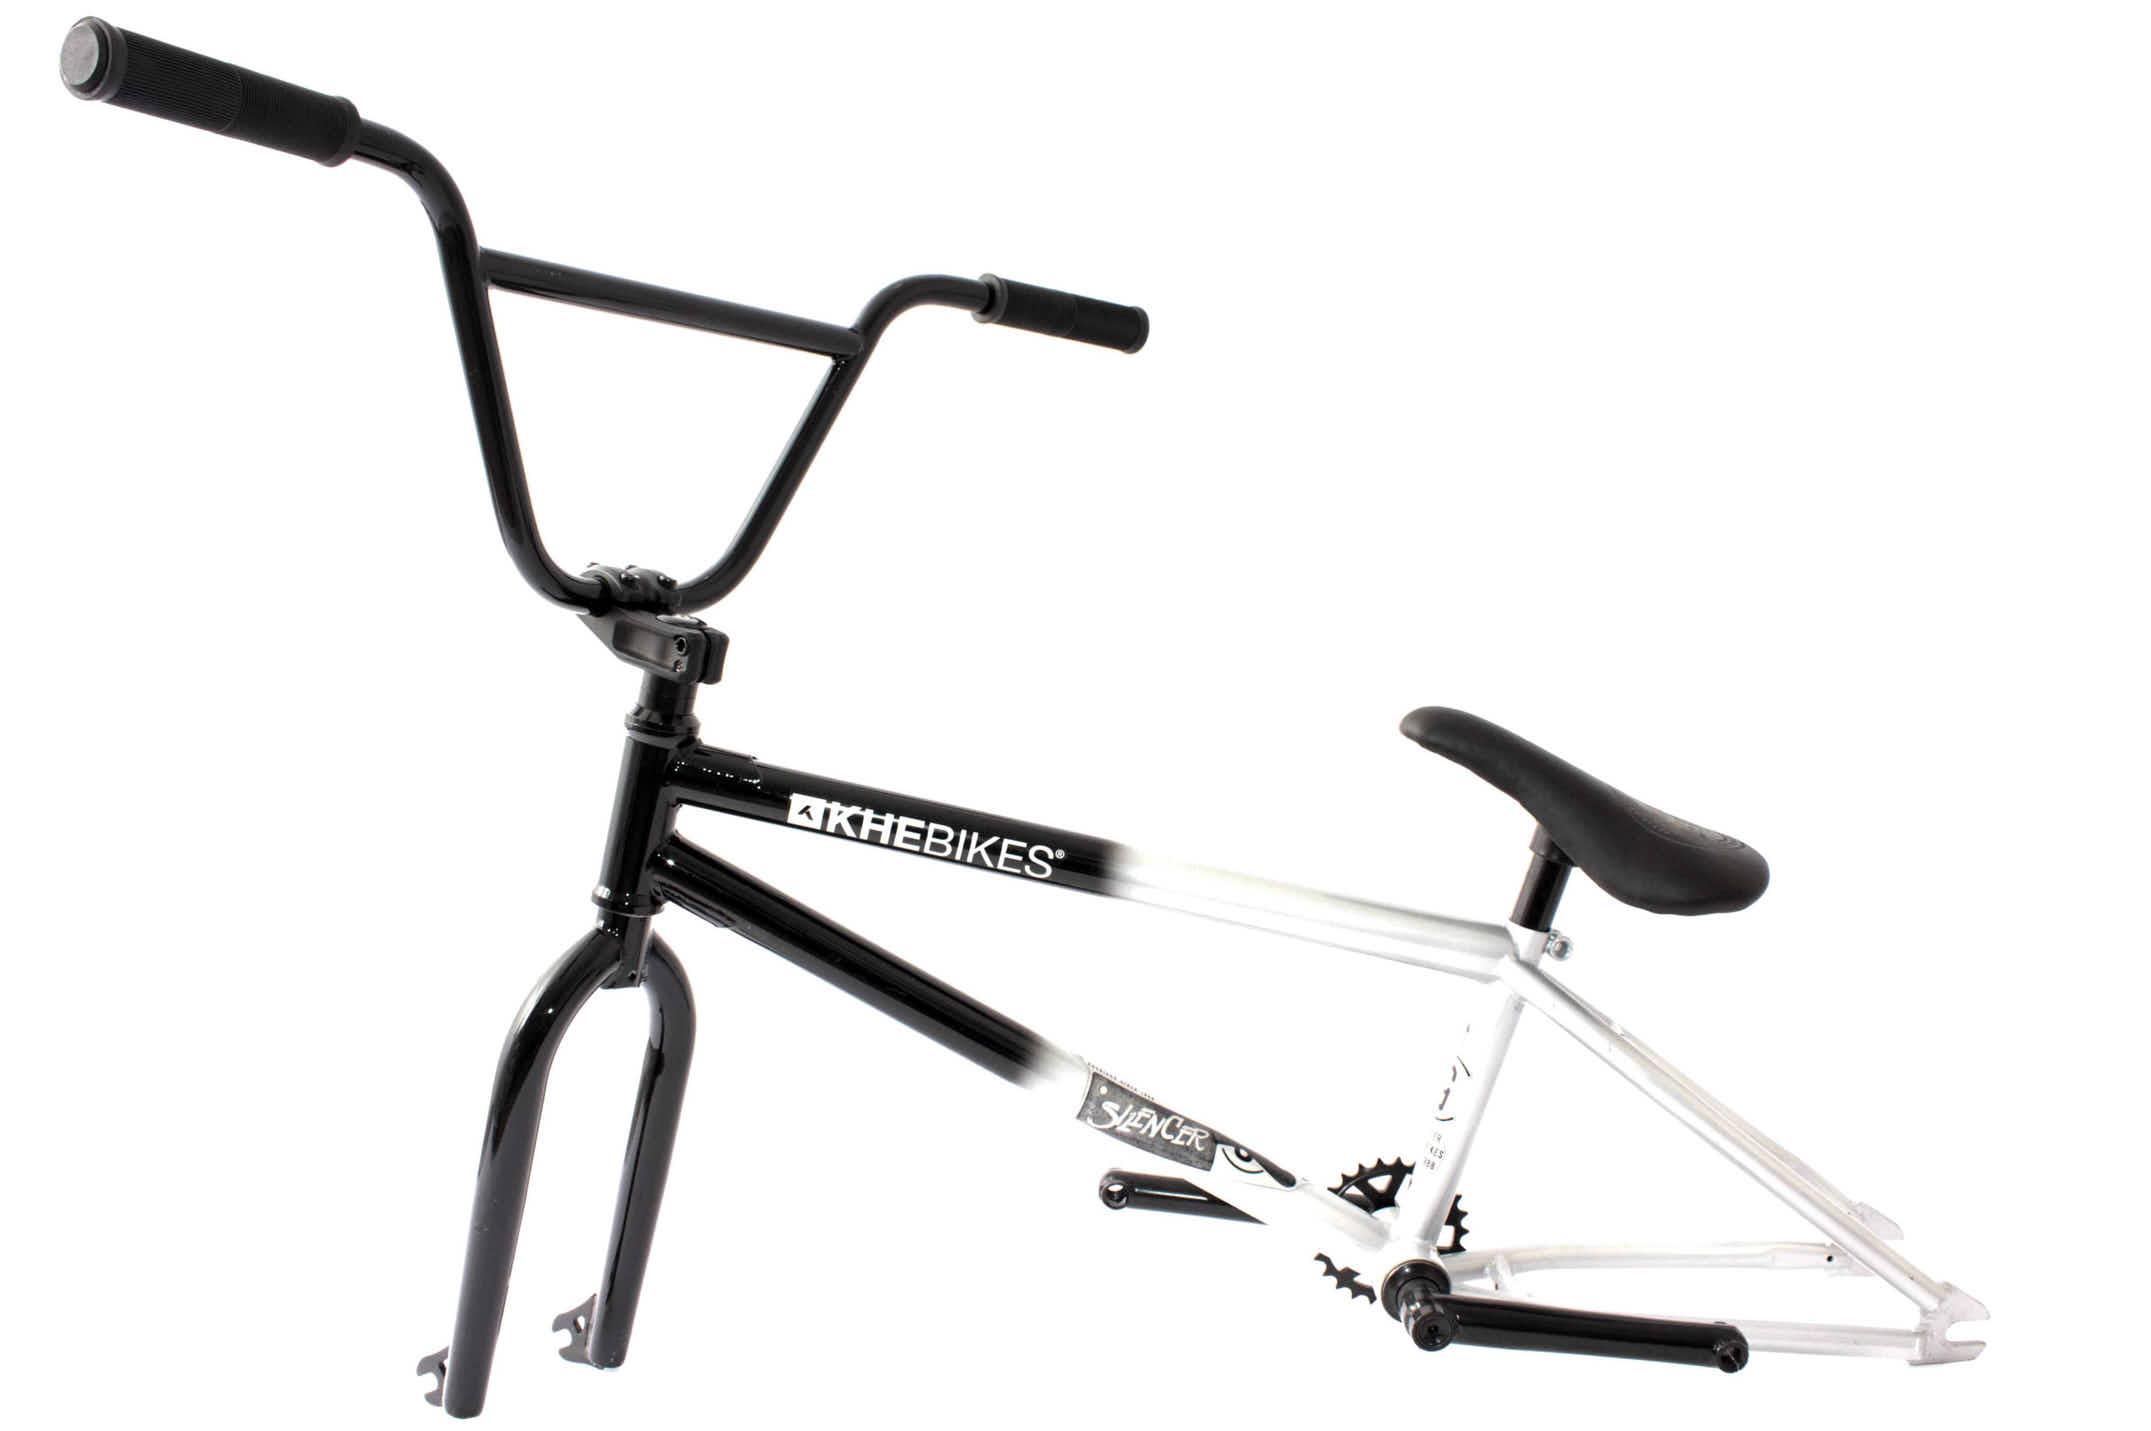 KHE Silencer Rahmenset - I4   Rahmen   BMX Teile   Offizieller ...